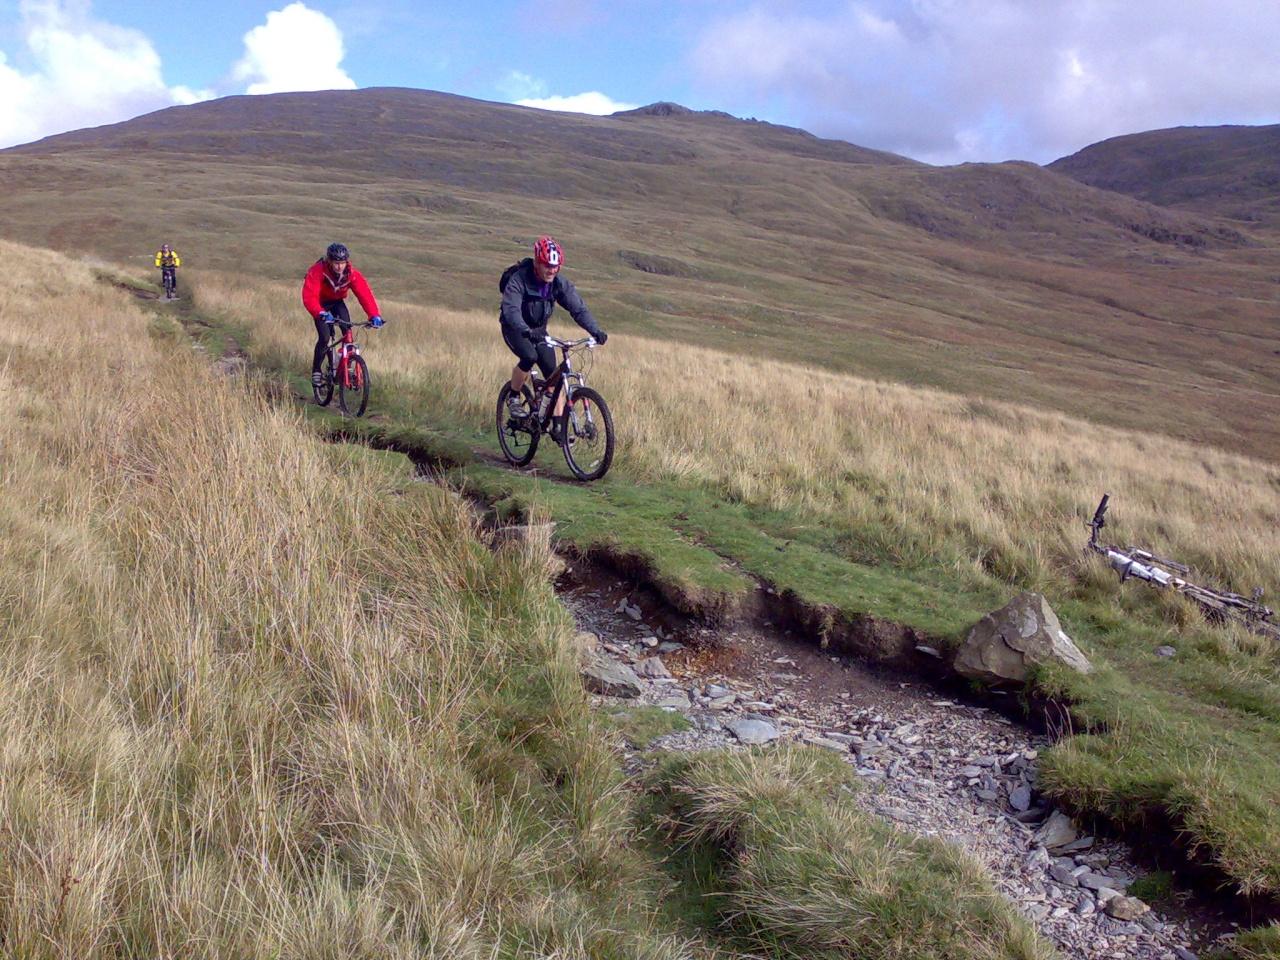 Dave and Jack descending